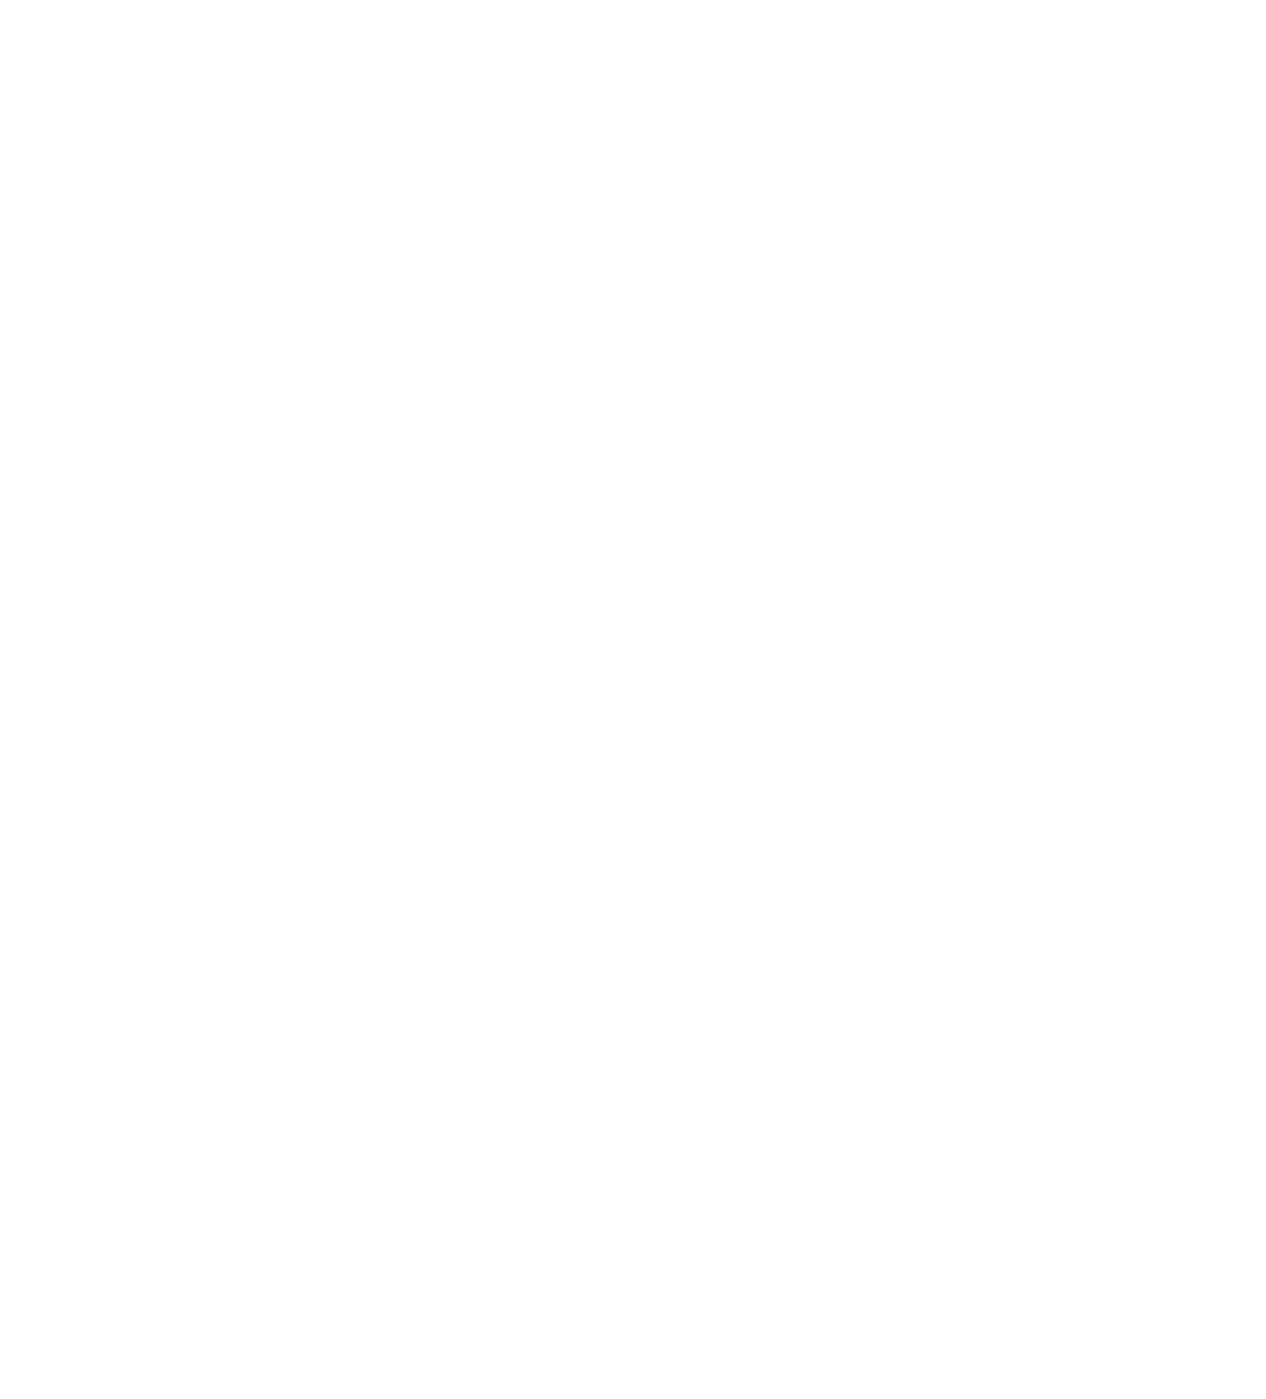 Panel Icon 2